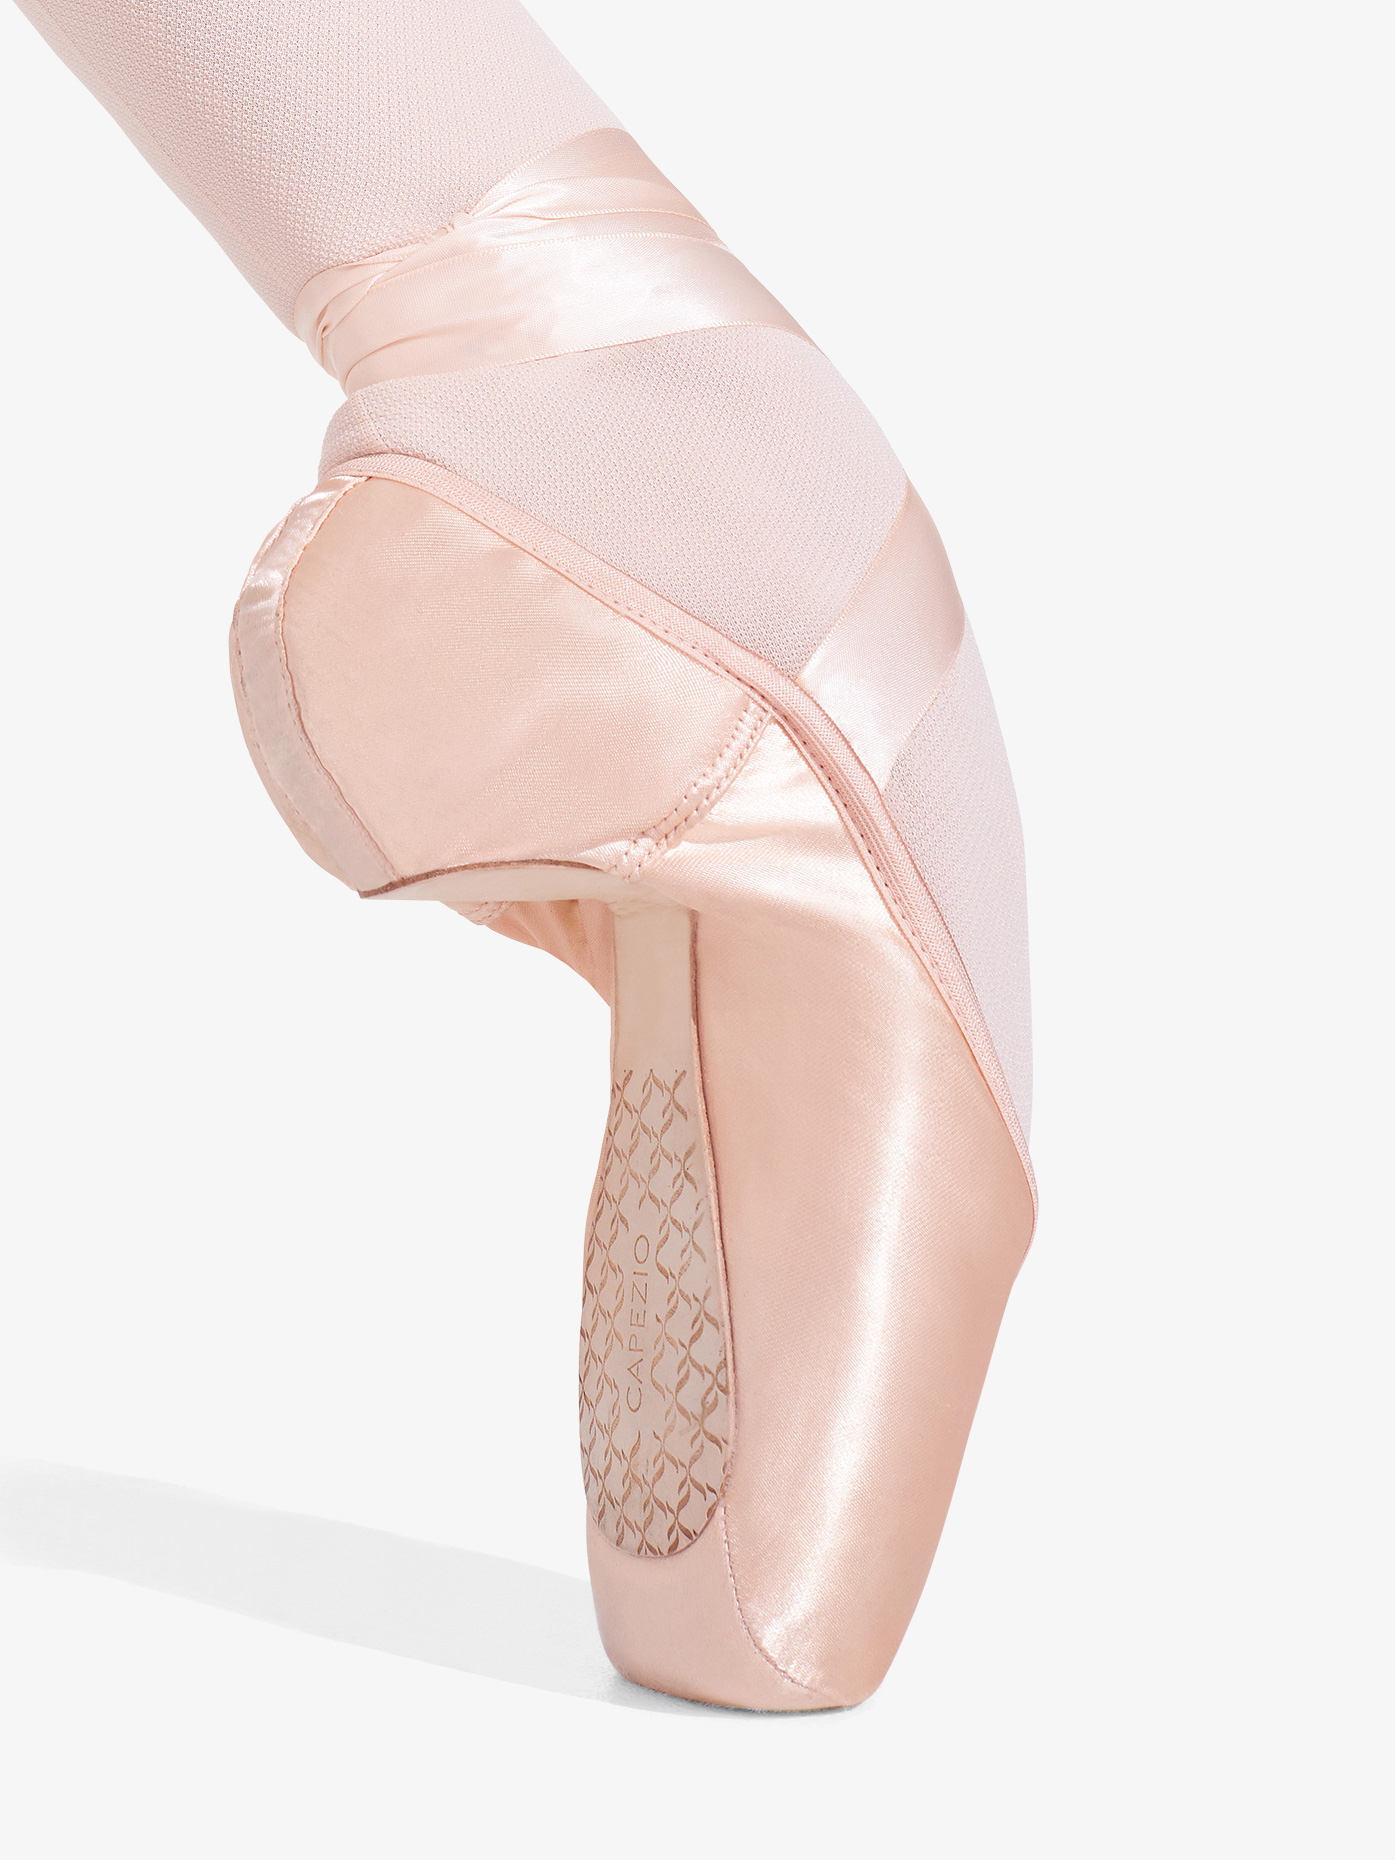 Capezio Womens Cambre Tapered Toe #4 Shank Pointe Shoes 1129W